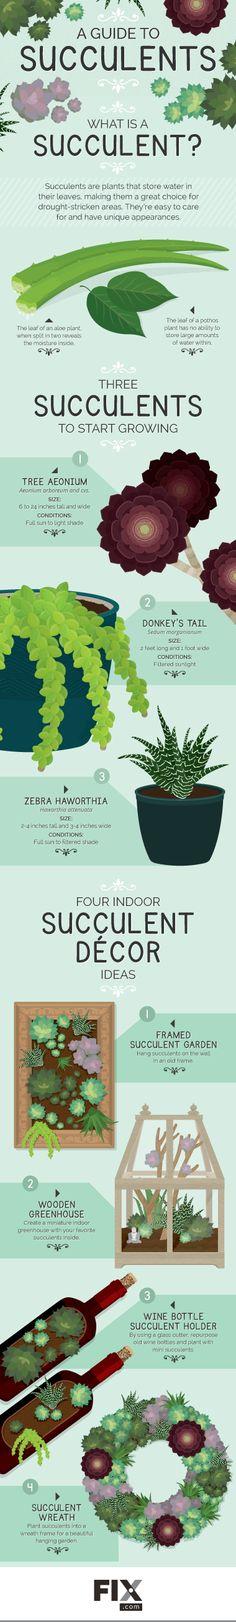 Gardening With Succulent Plants   Fix.com